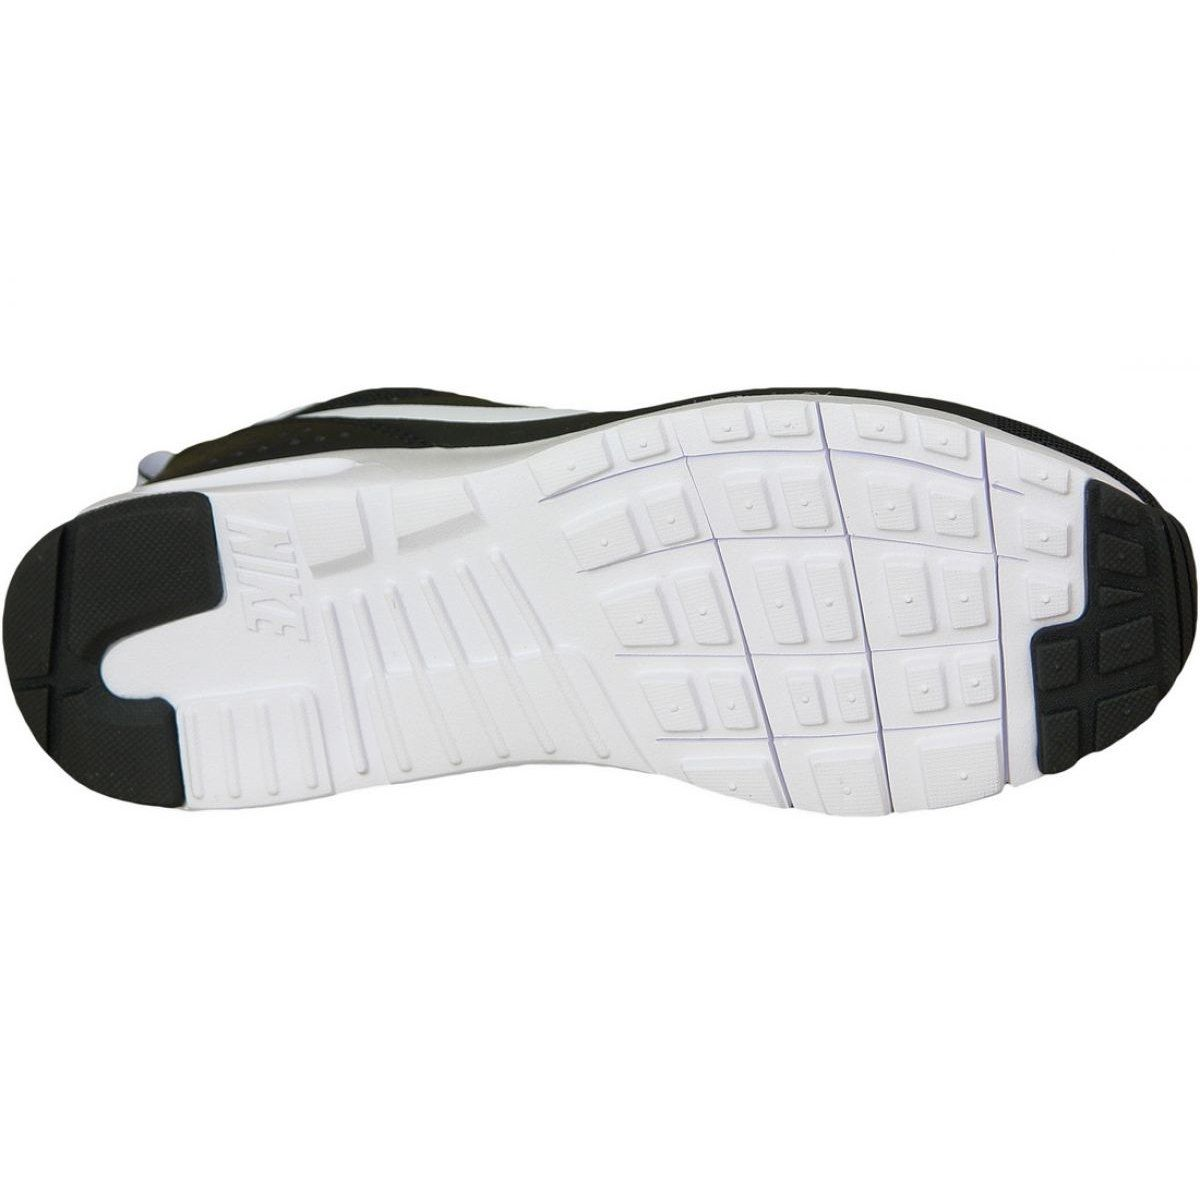 Buty Nike Air Max Tavas Gs W 814443 001 Czarne Buty Nike Buty Nike Air Max